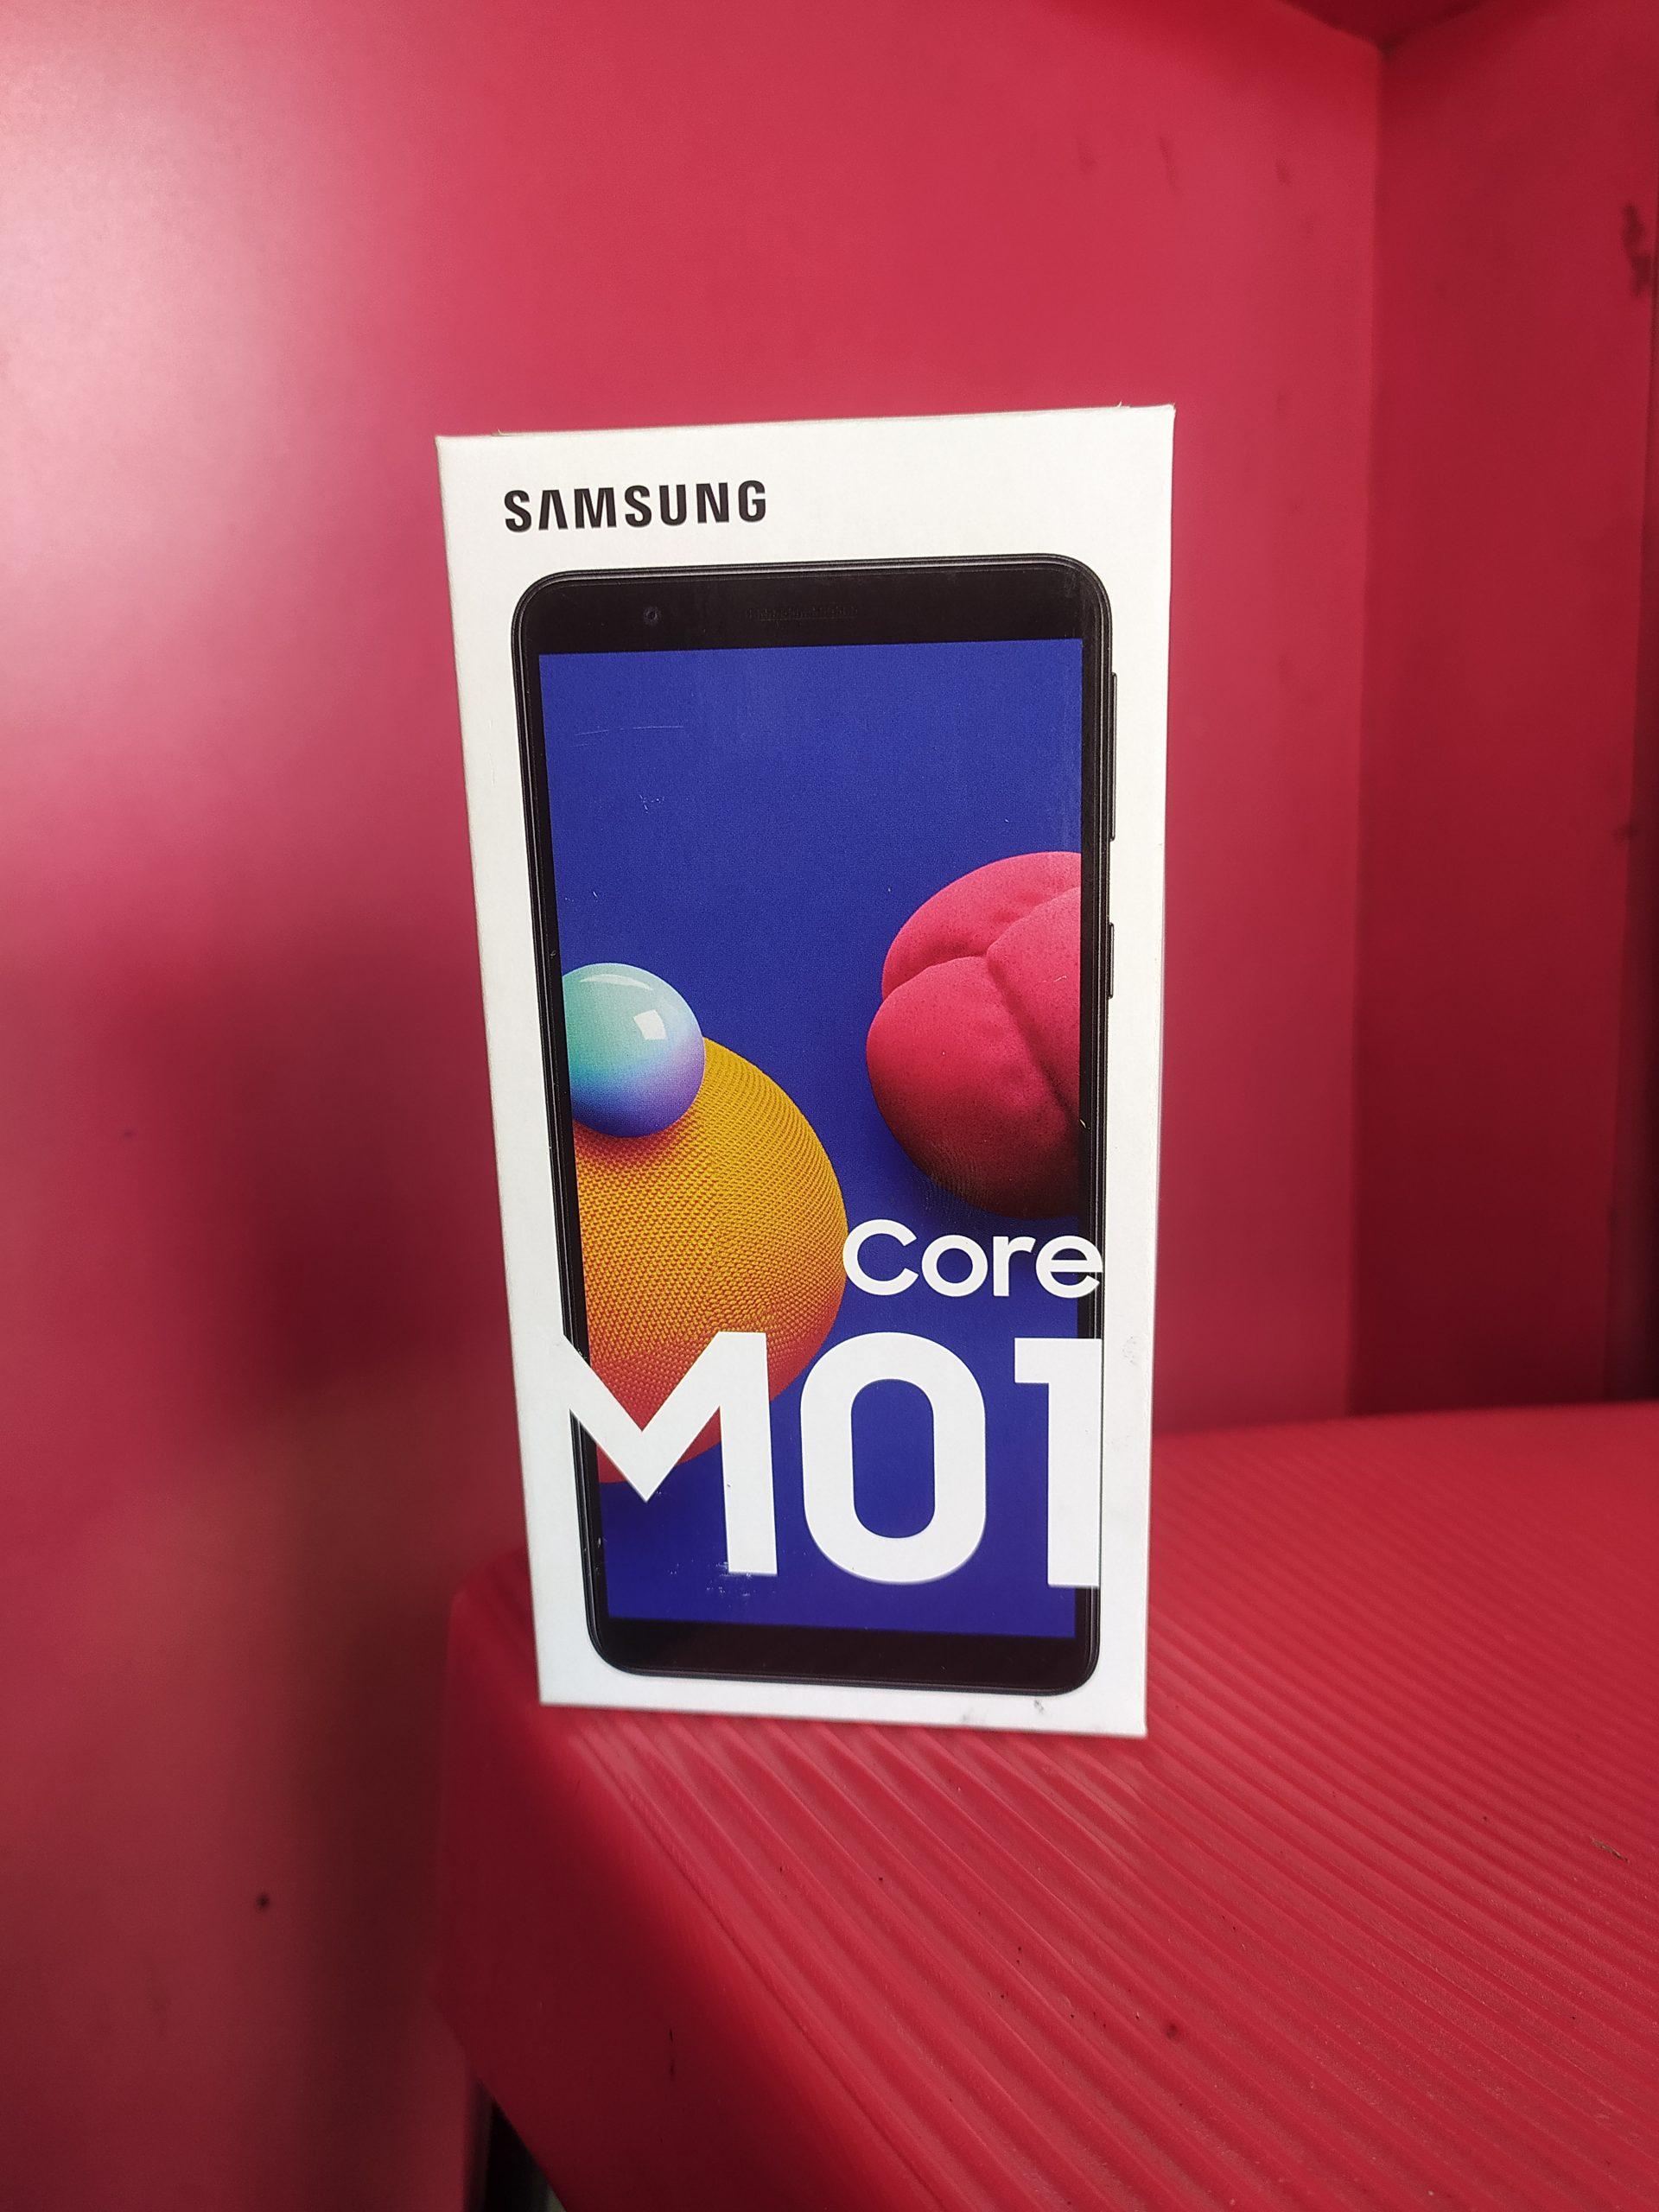 A Samsung mobile Pamphlet